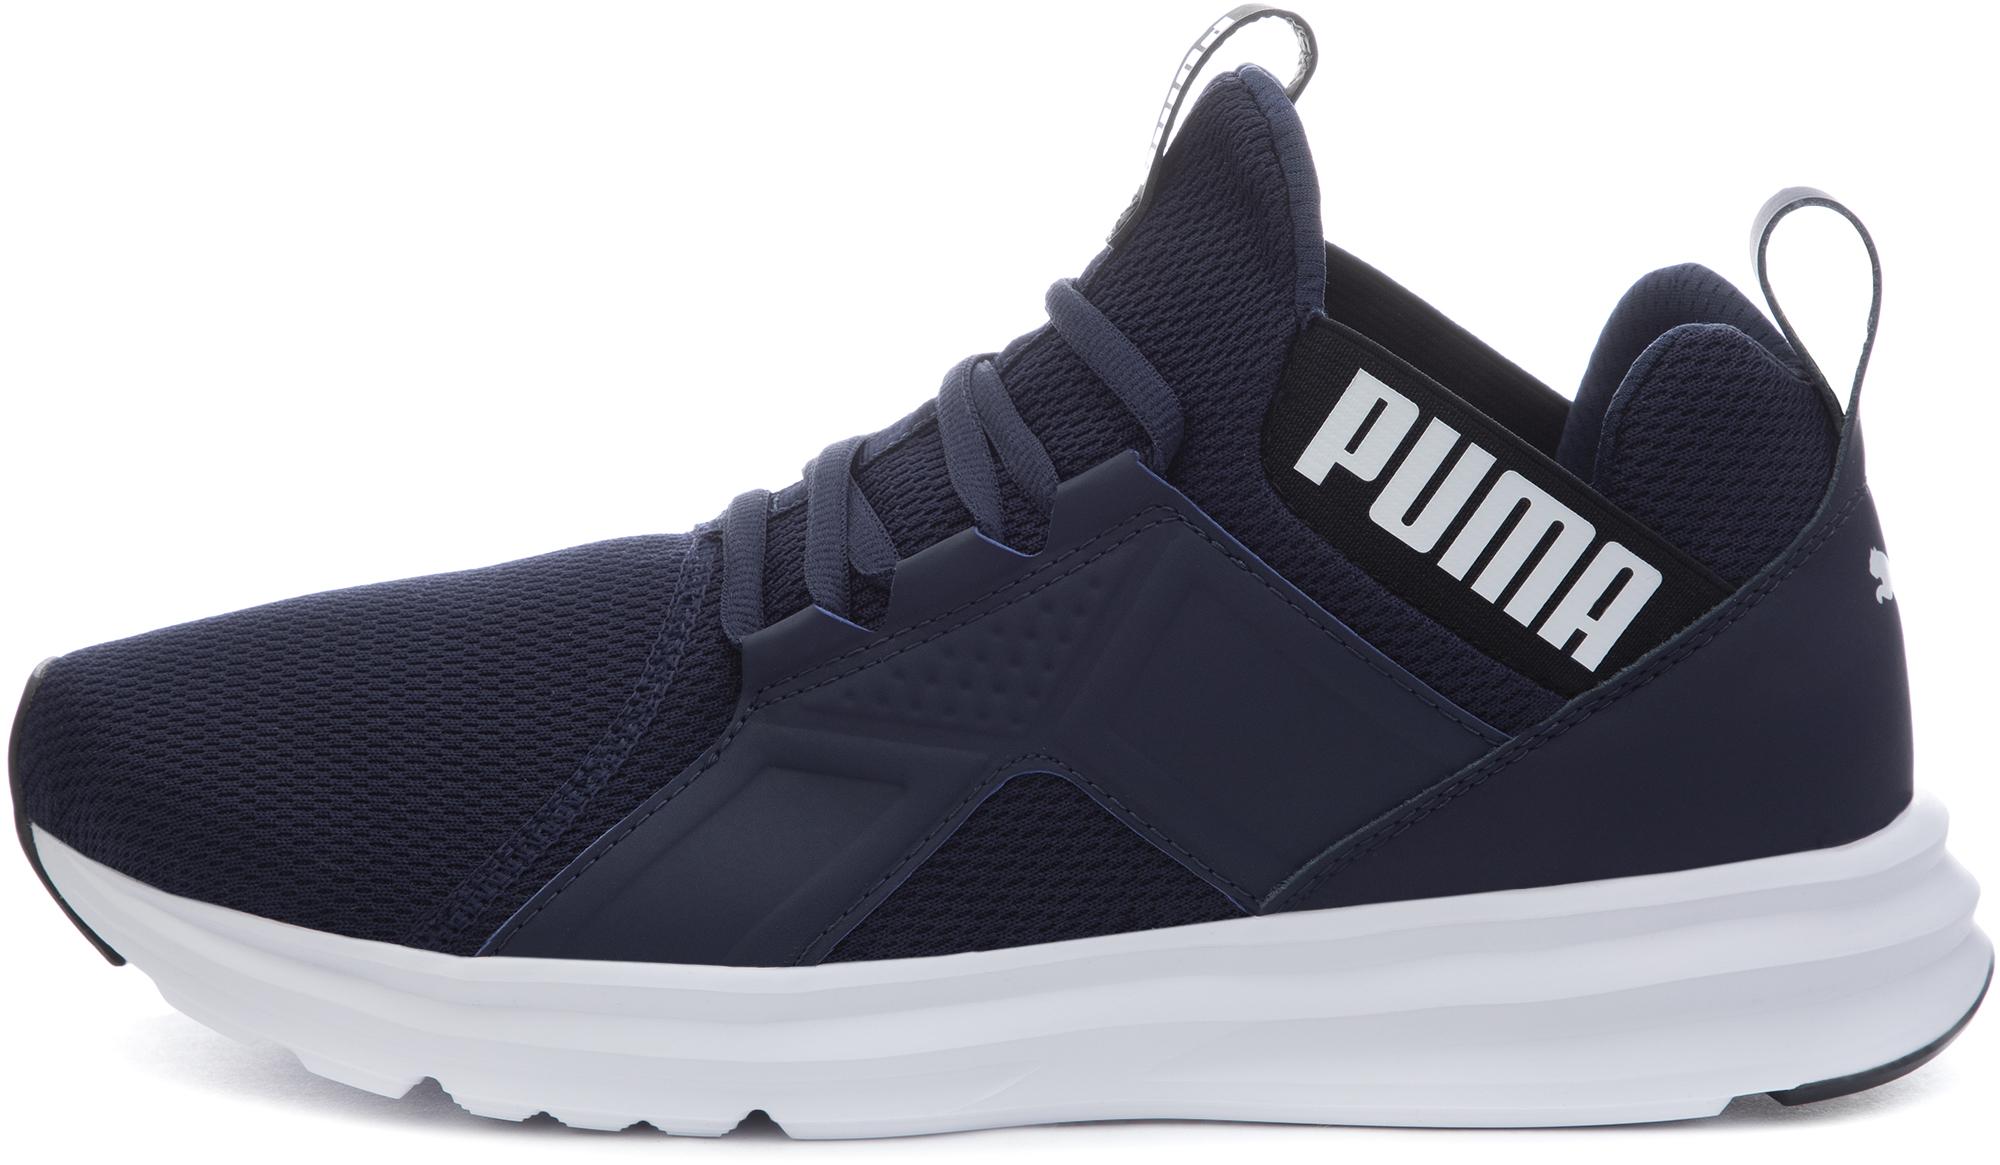 Puma Кроссовки мужские Enzo Sport, размер 46